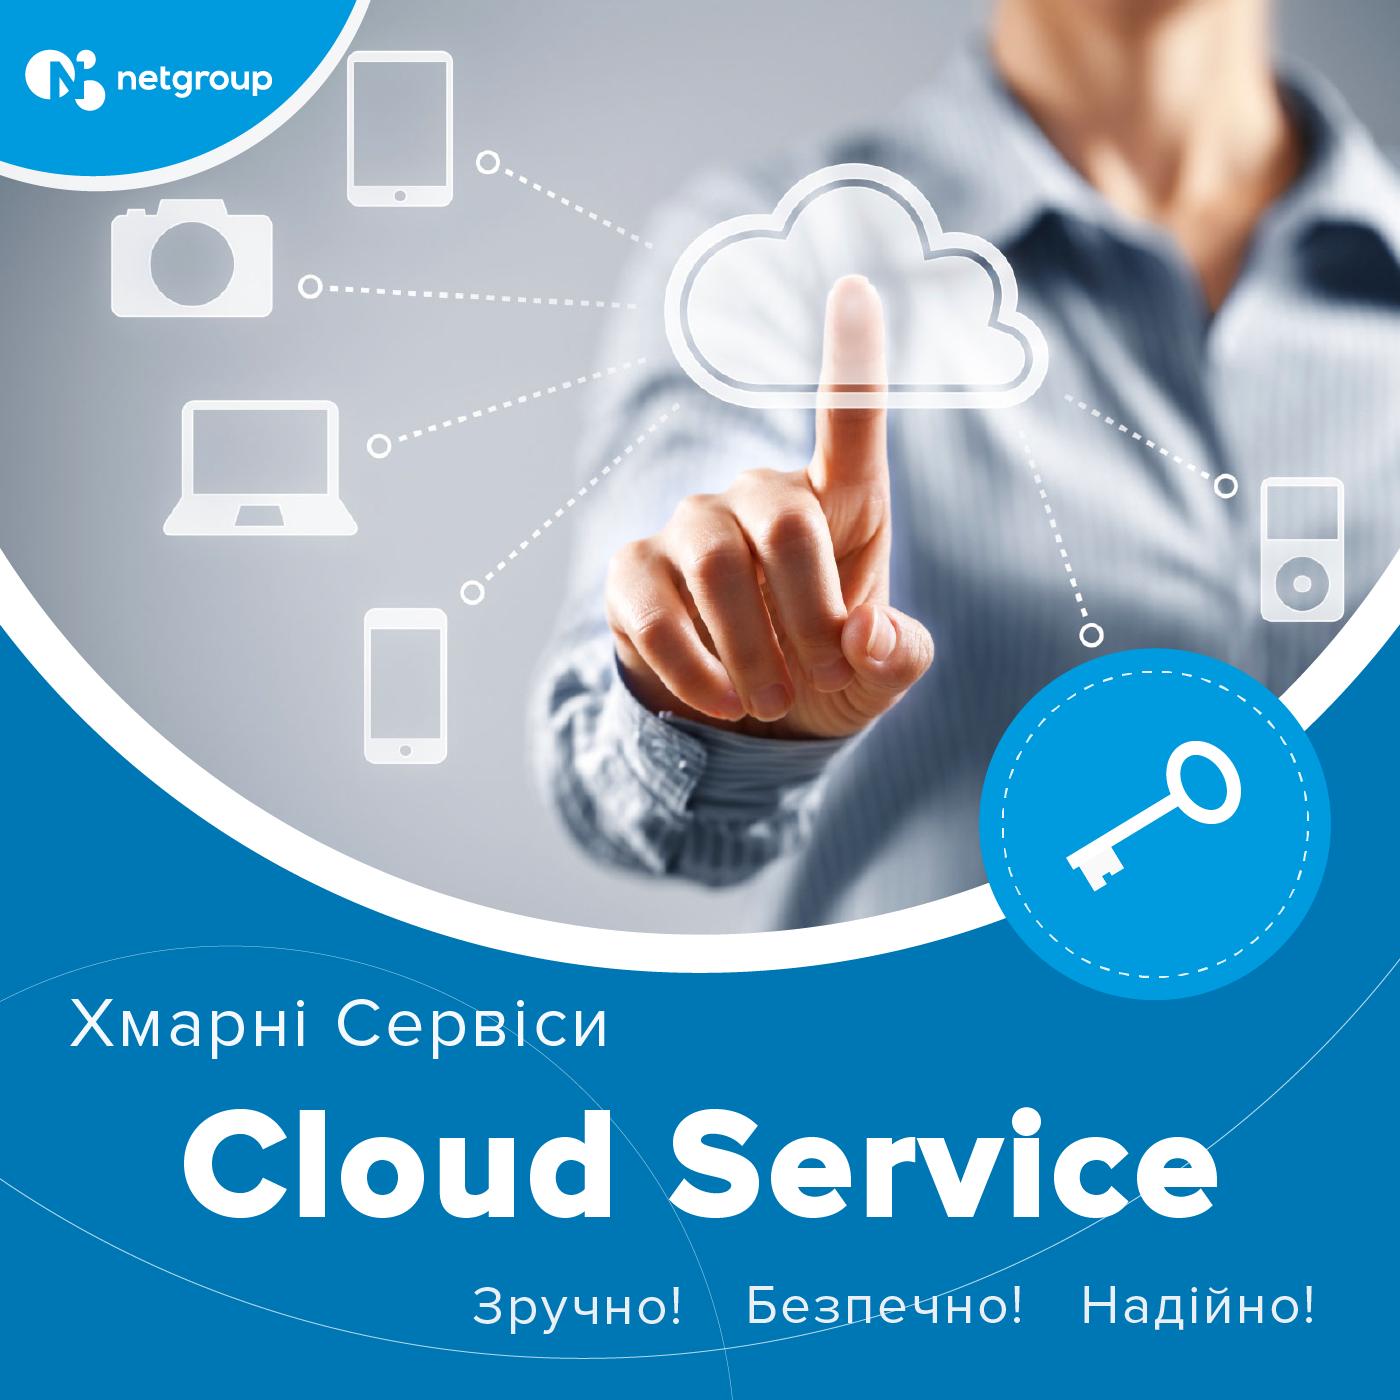 хмарні сервіси | cloud service | netgroup